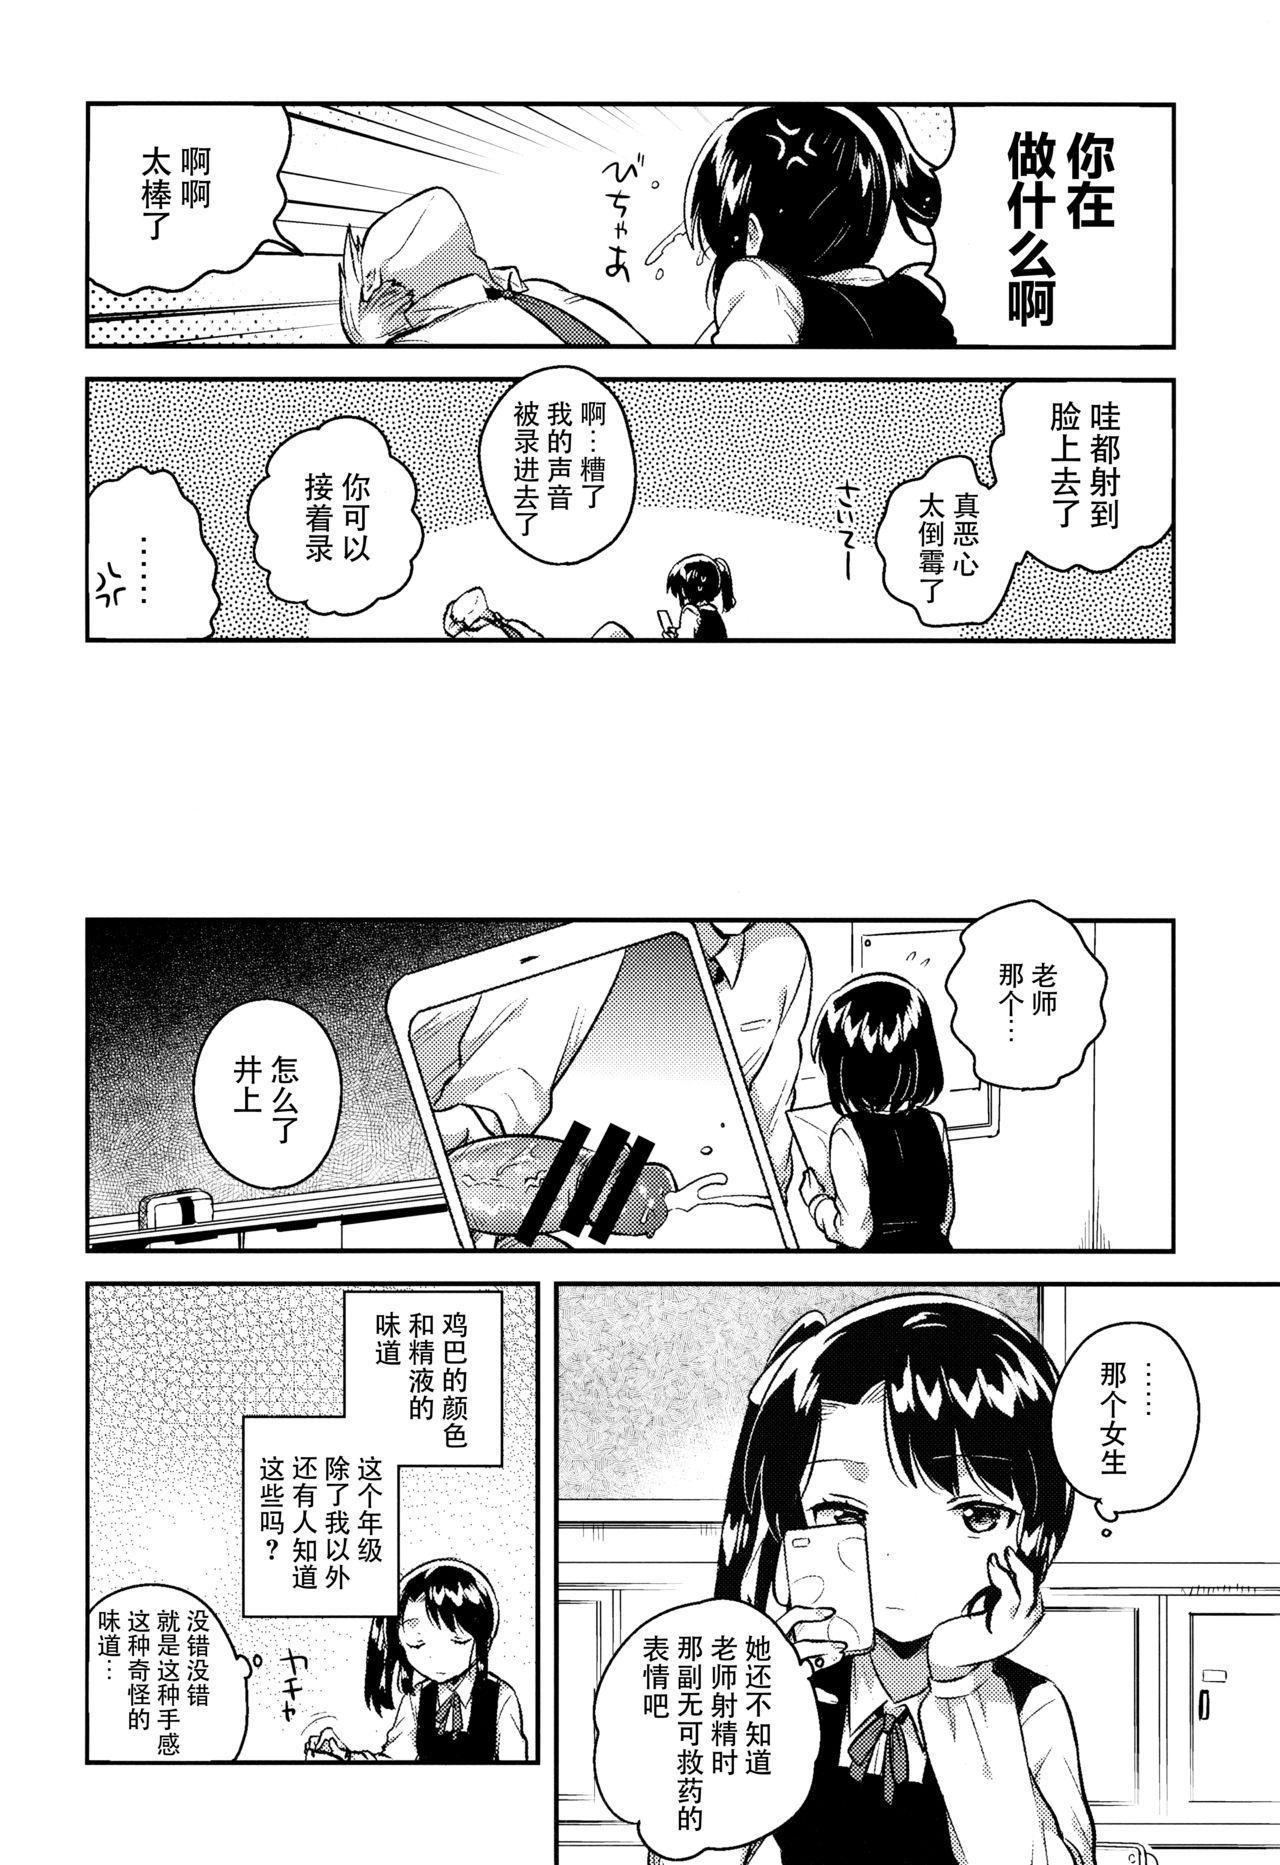 (SC2018 Spring) [squeezecandyheaven (Ichihaya)] Sensei wa Lolicon de Saitei Hentai no Gomikuzu [Zen] + Omake [Chinese] [脸肿汉化组] 11